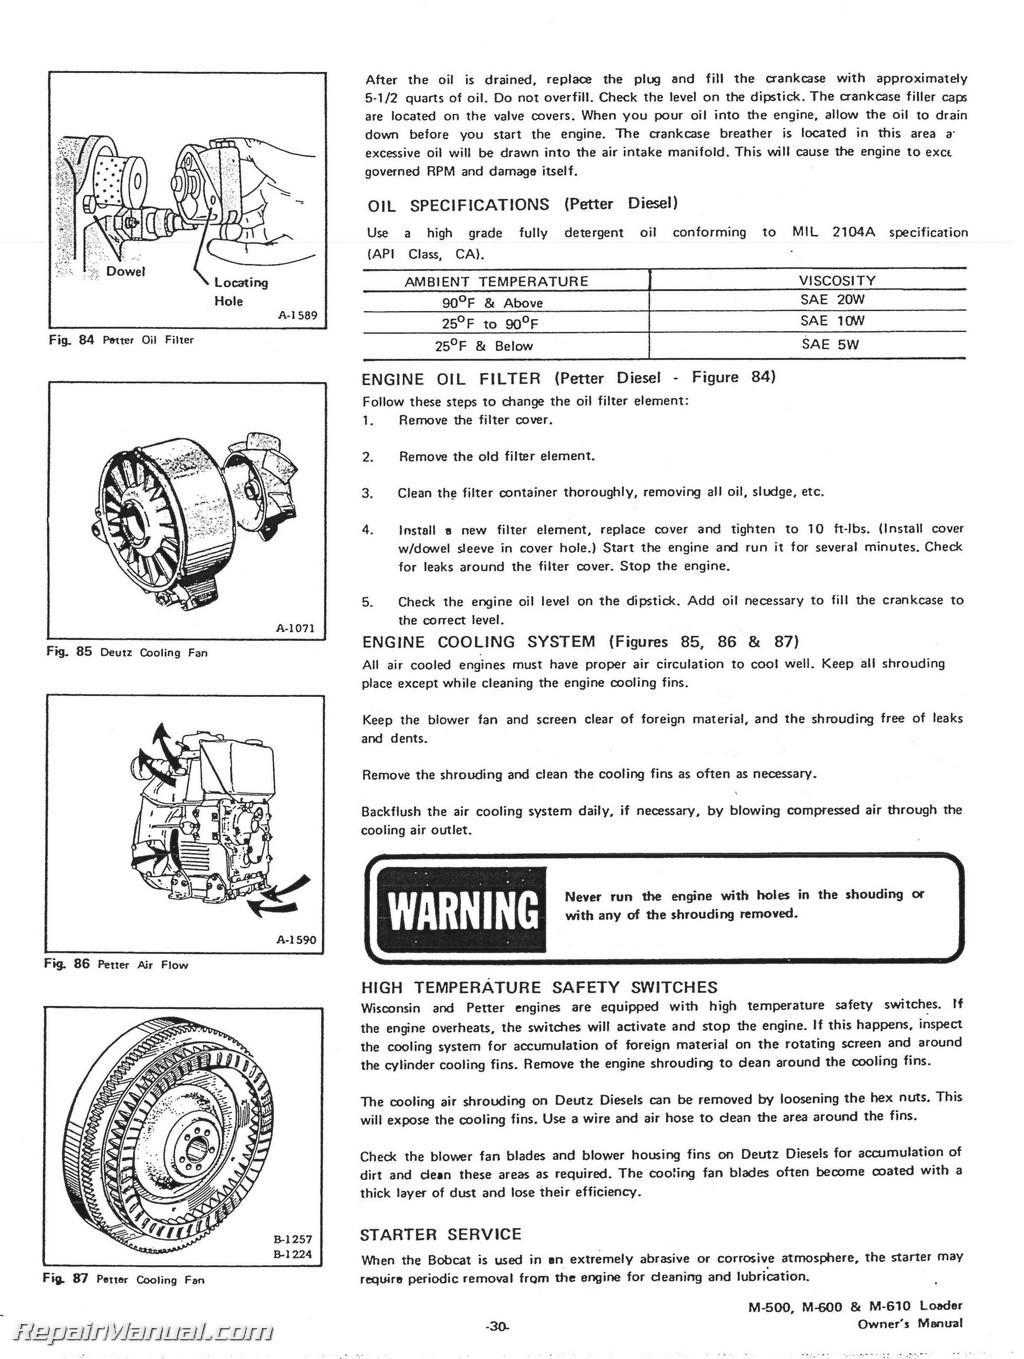 bobcat 500 600 610 loaders operators manual rh repairmanual com Standard Operating Manual User Manual